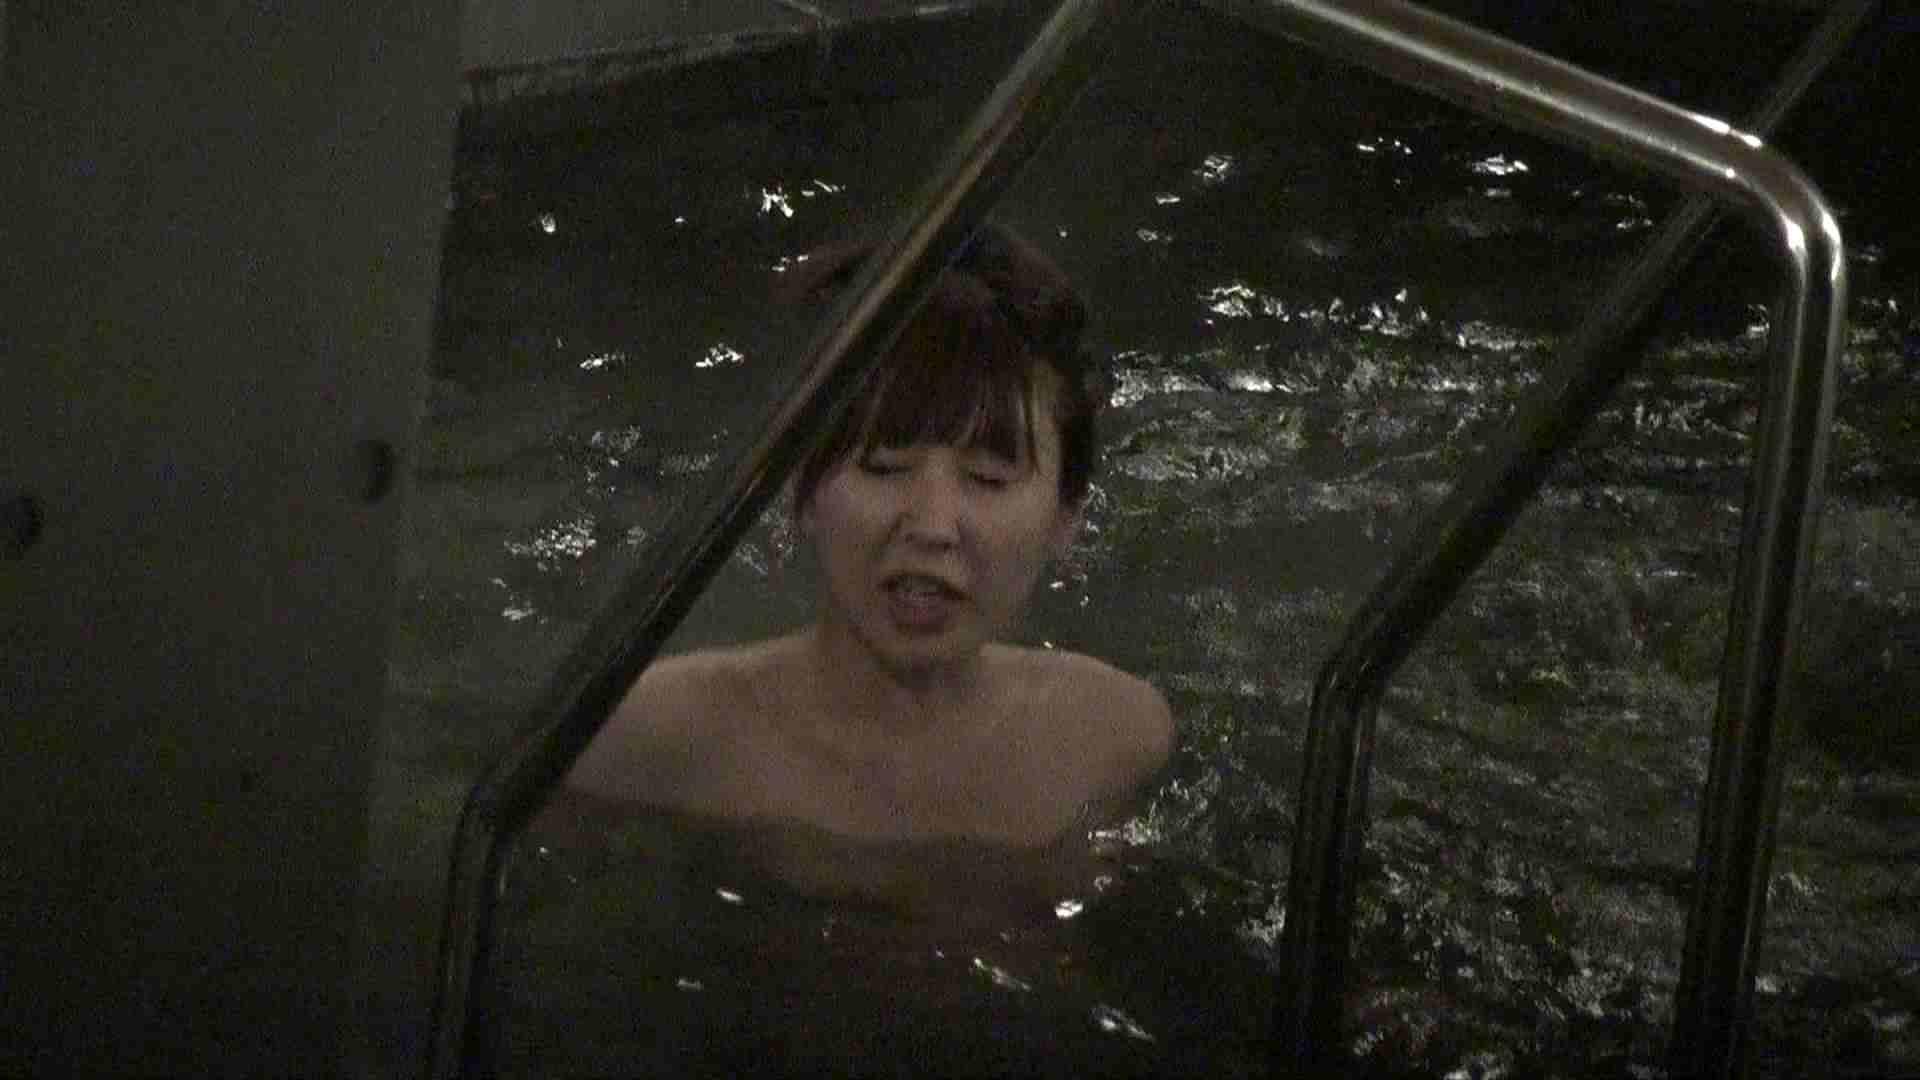 Aquaな露天風呂Vol.410 露天風呂編 | 盗撮シリーズ  94PIX 93